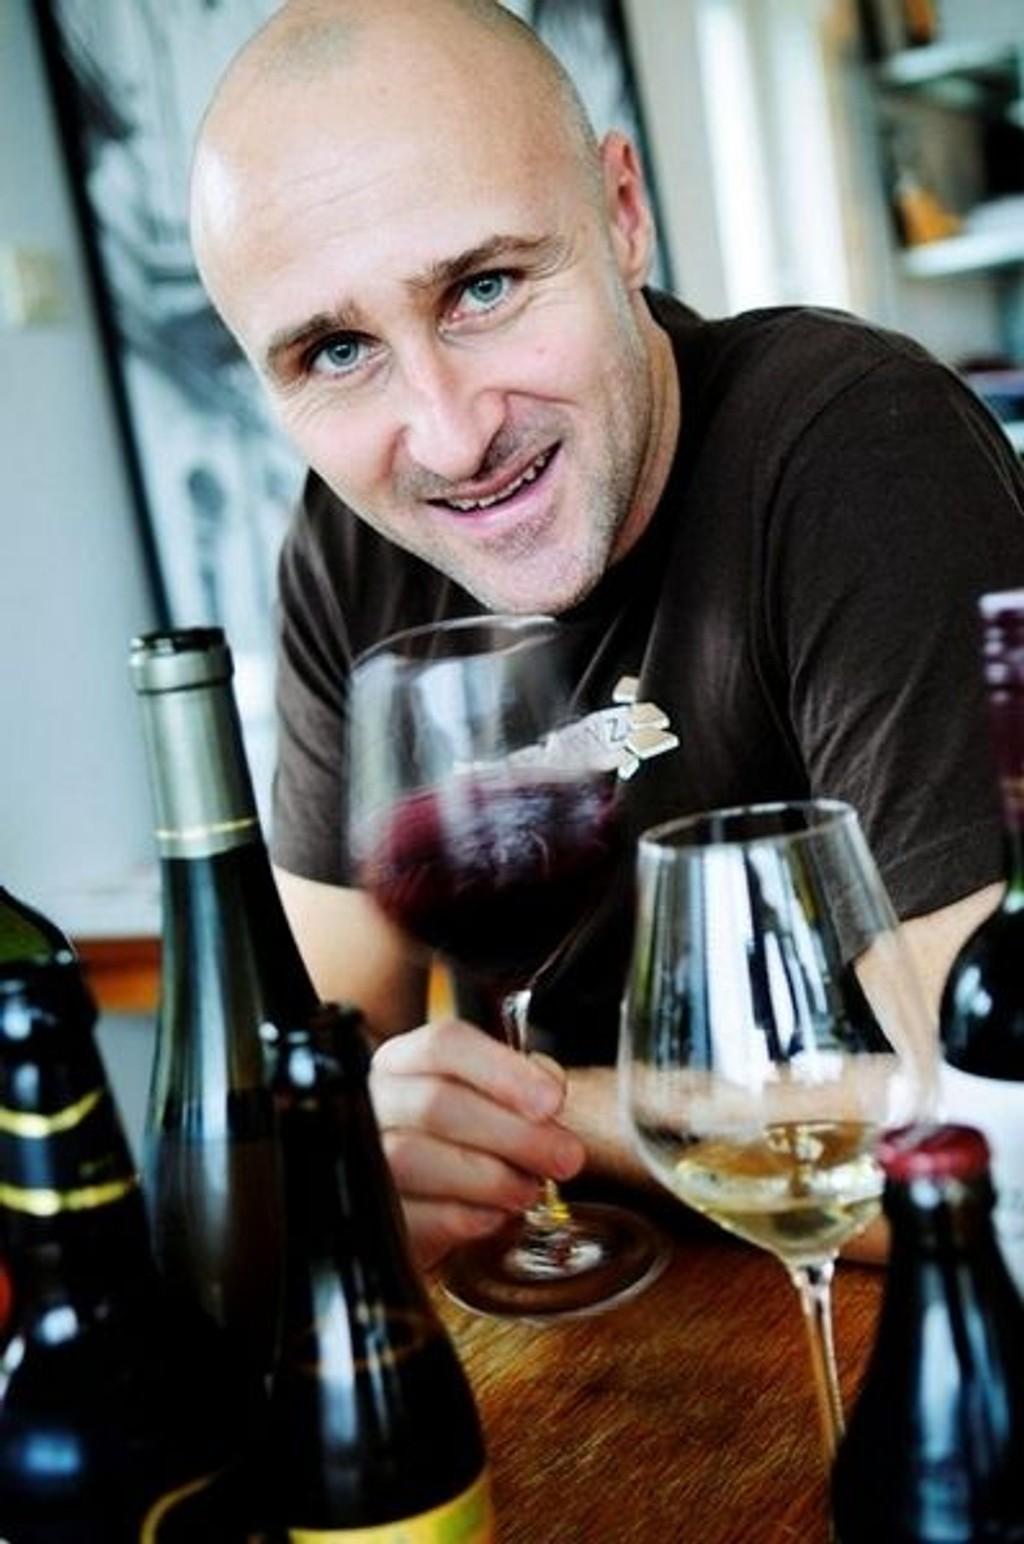 "EKSPERT: Ole Martin Alfsen er vinkelner og fagansvarlig for mat og drikke ved Kulinarisk Akademi. Ansvarlig for vinkelnerutdannelsen i Norge. Du ser ham også som ekspert i ""4 stjerners middag"" på TVNorge. (FOTO: Tore Sandberg)"